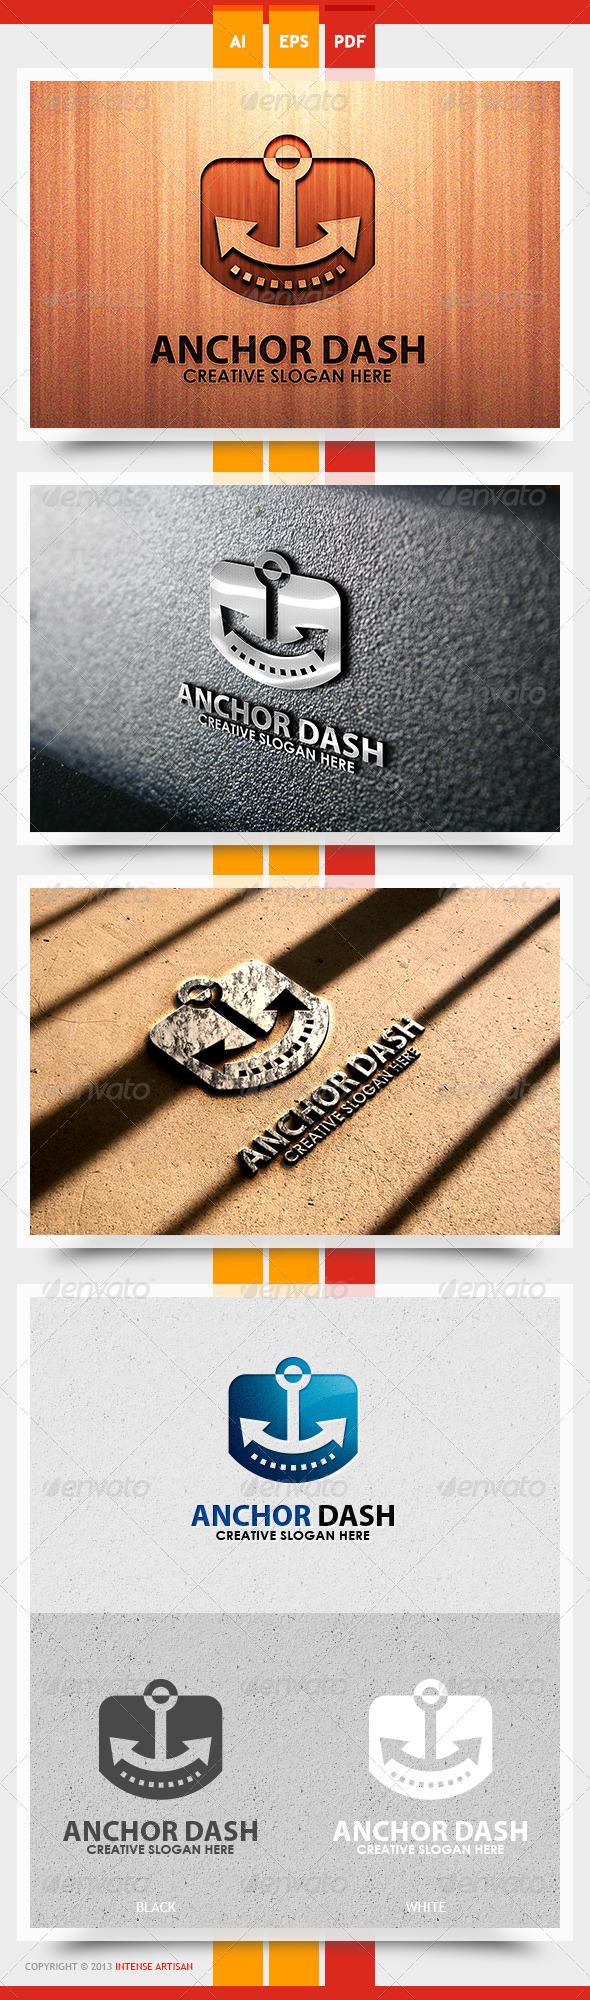 Anchor Dash Logo Template - Objects Logo Templates